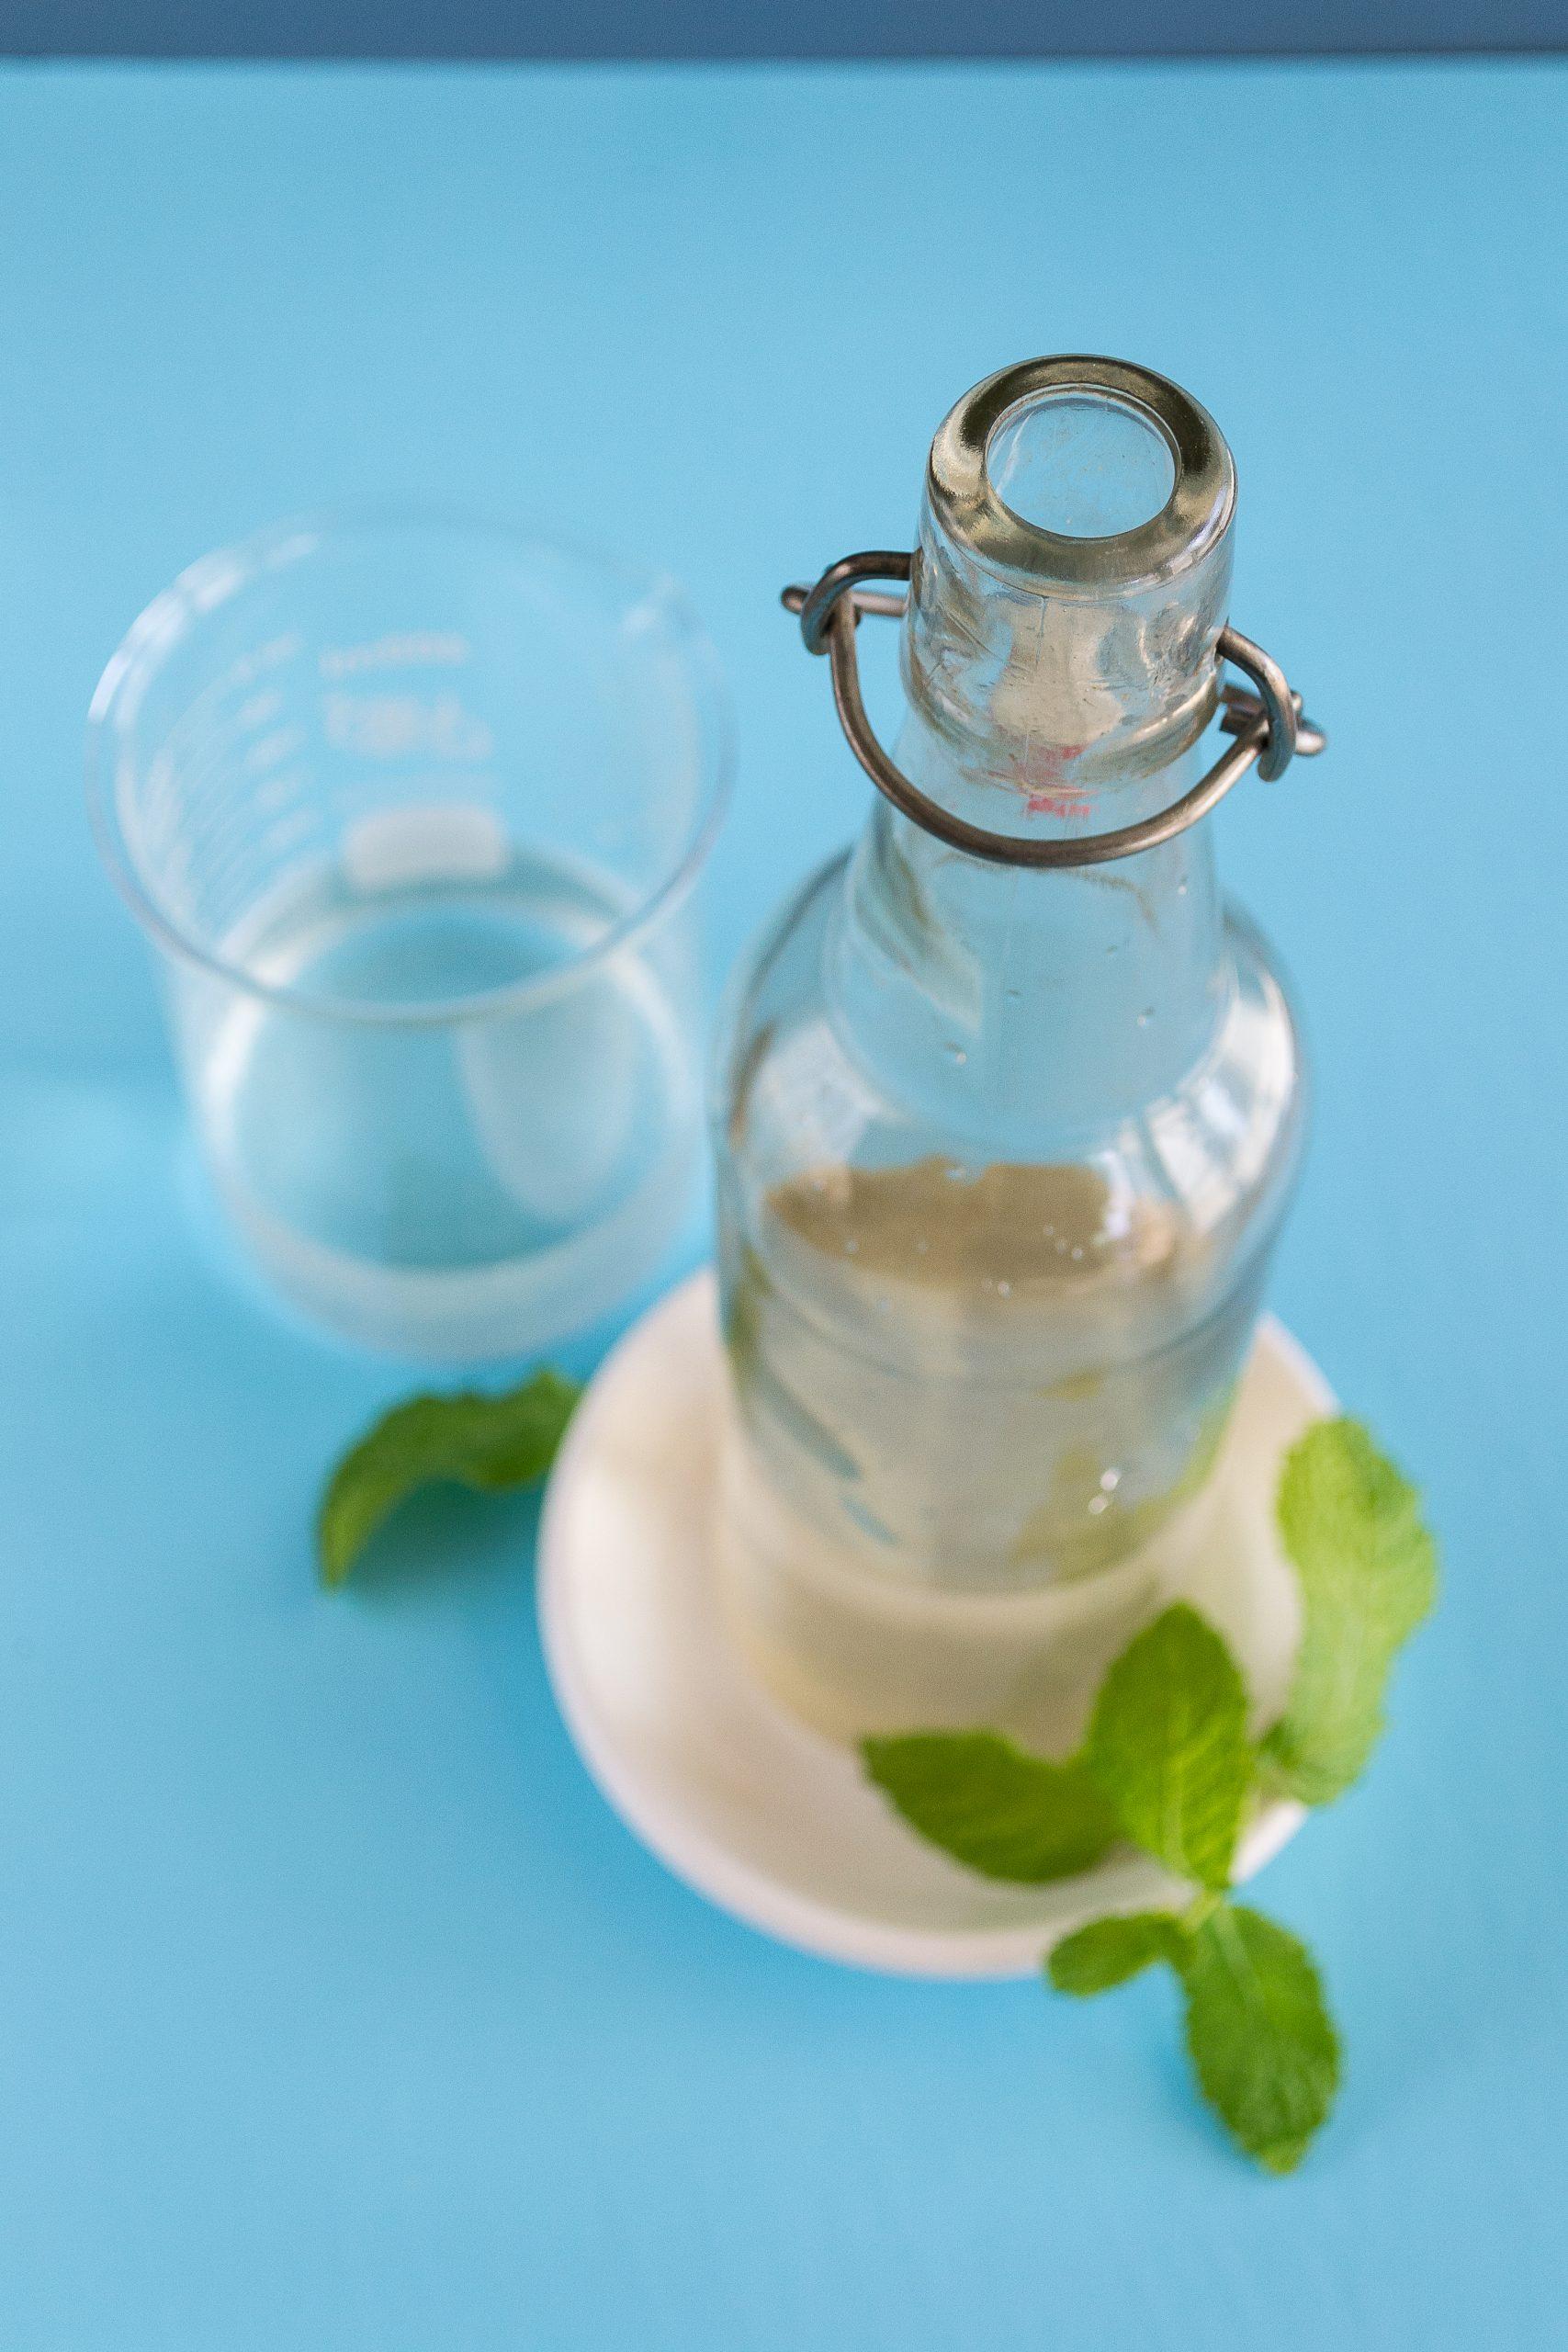 Alcohol-free, Sugar-free Minty Mouthwash by Unrefined Vegan